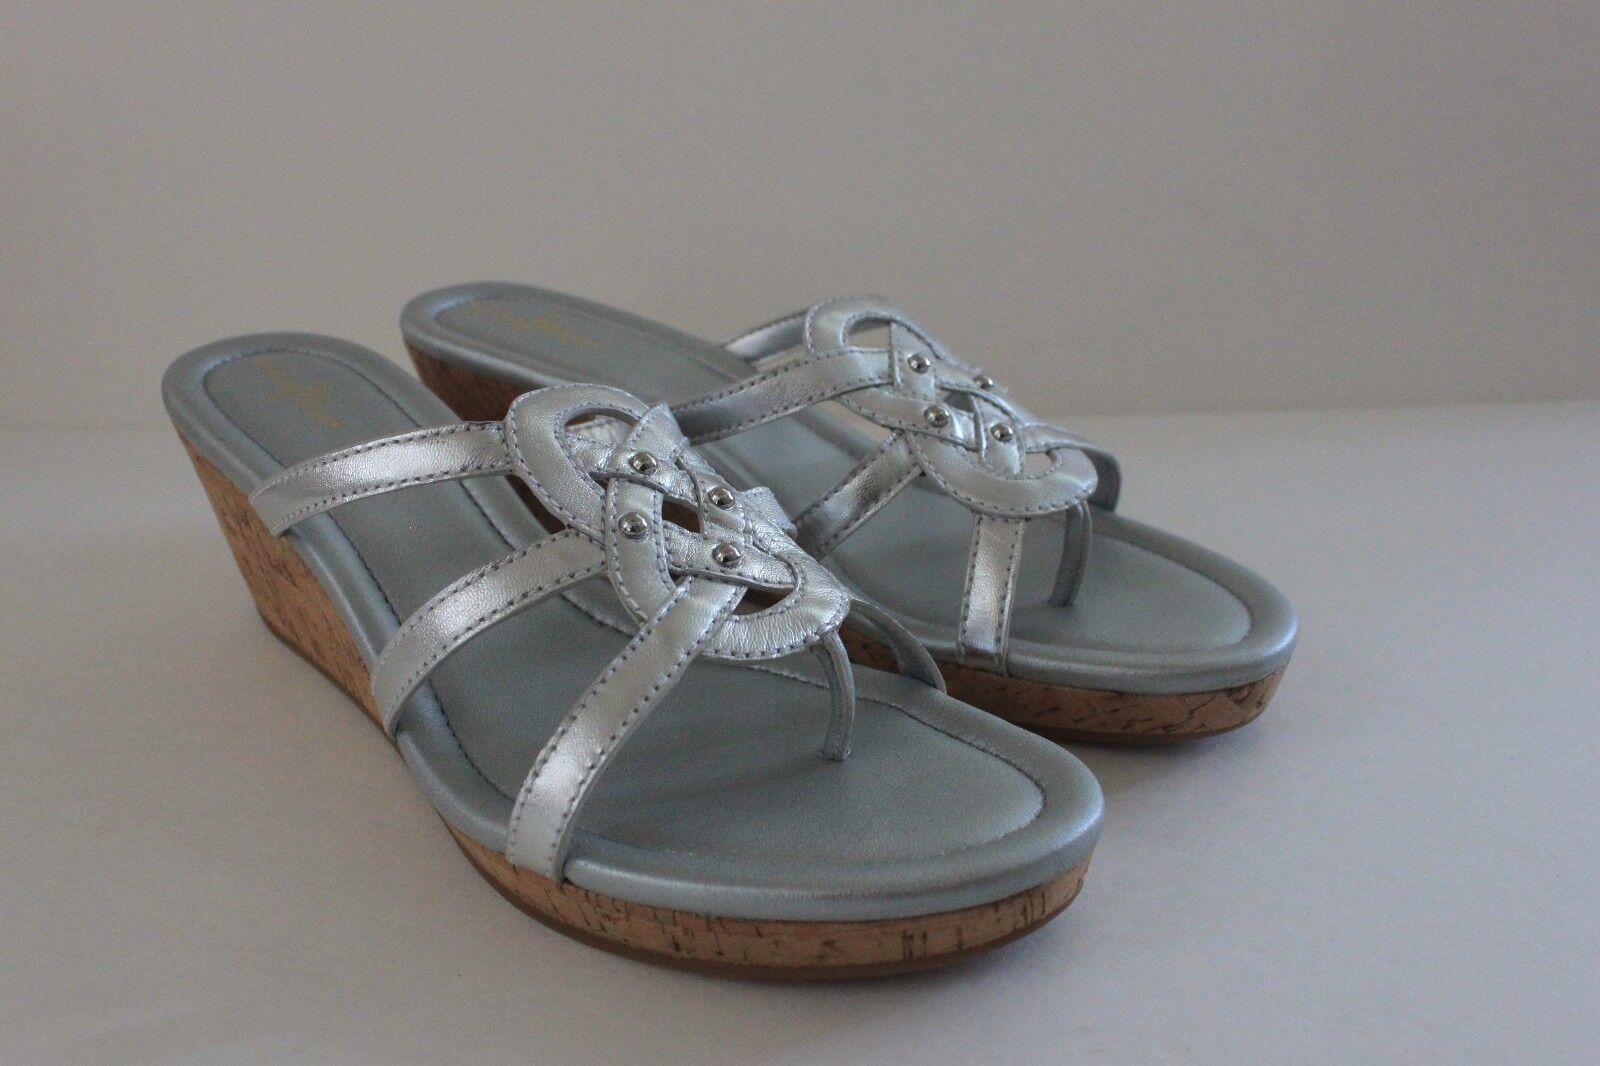 Cole Haan Donna Shayla Thong Argento Metallic Wedge Shoe Slide Sandal Size 10